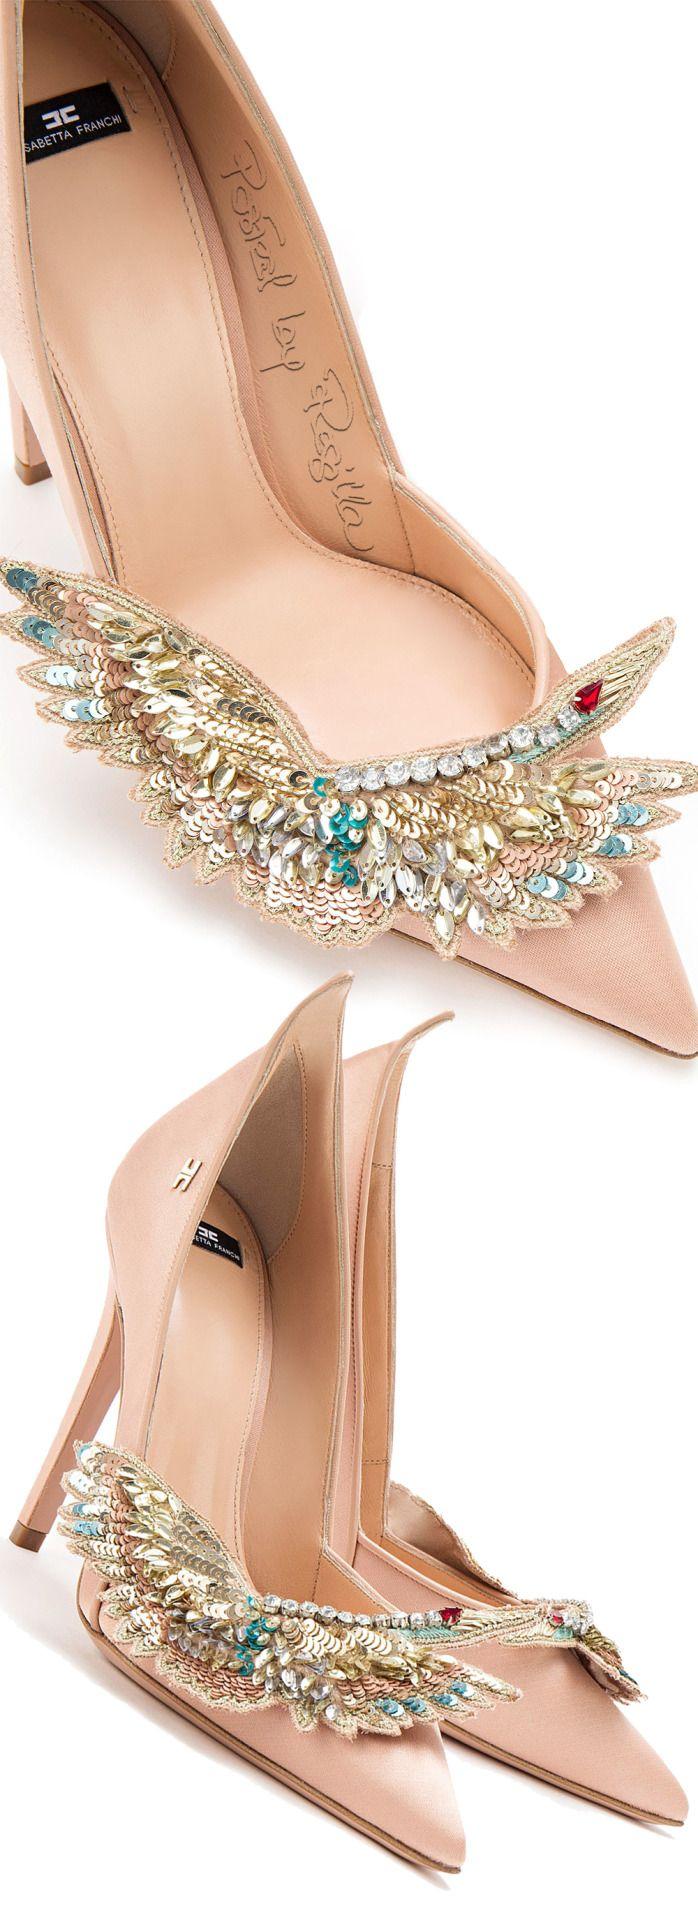 Chaussures - Sandales Post Orteil Elisabetta Franchi 3c88X0tw